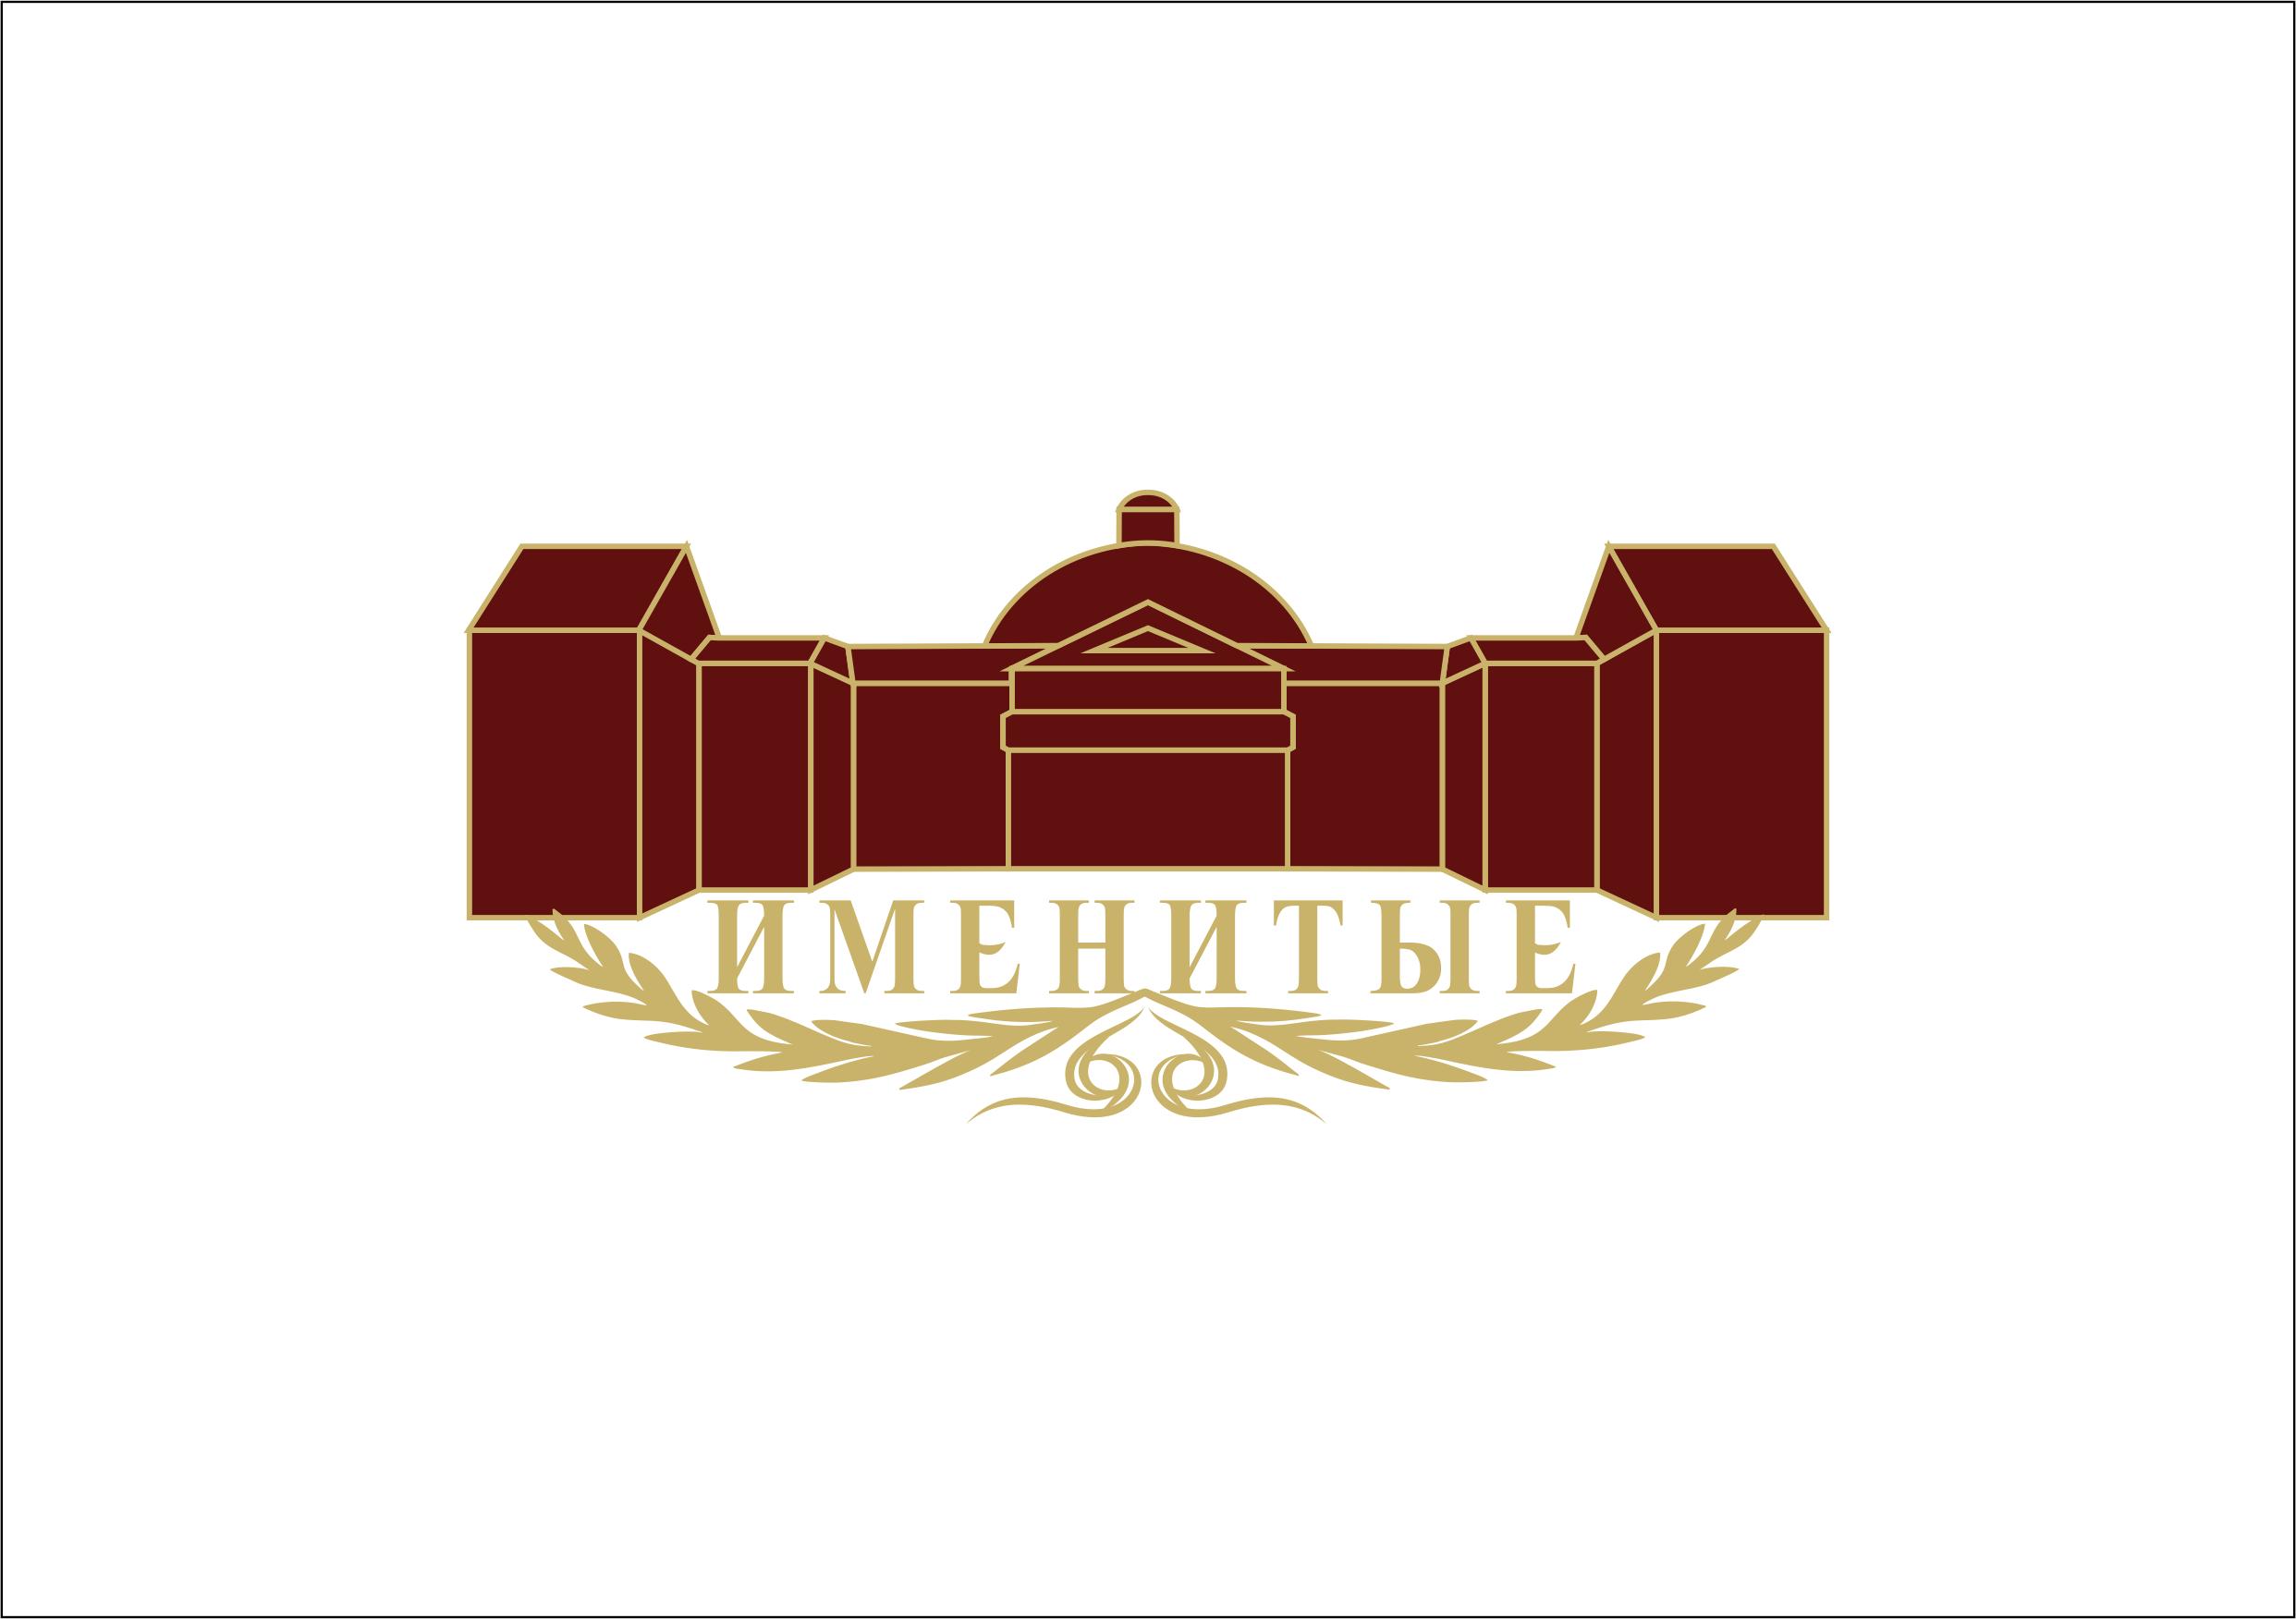 Логотип и фирменный стиль продуктов питания фото f_5195bc3be7012216.png